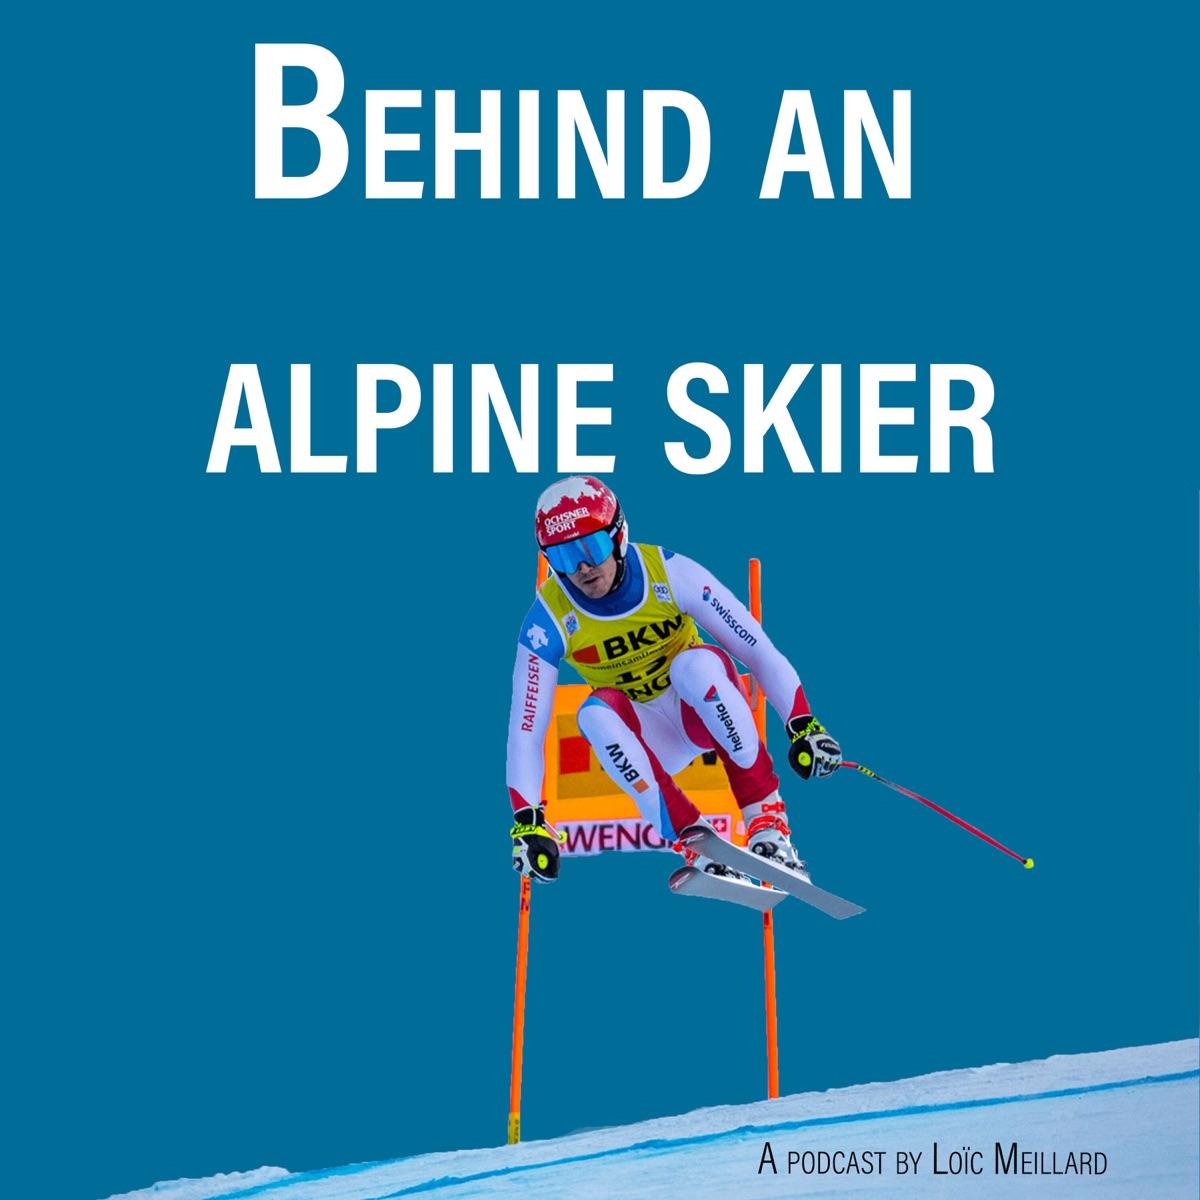 Behind an alpine skier : A podcast by Loïc Meillard